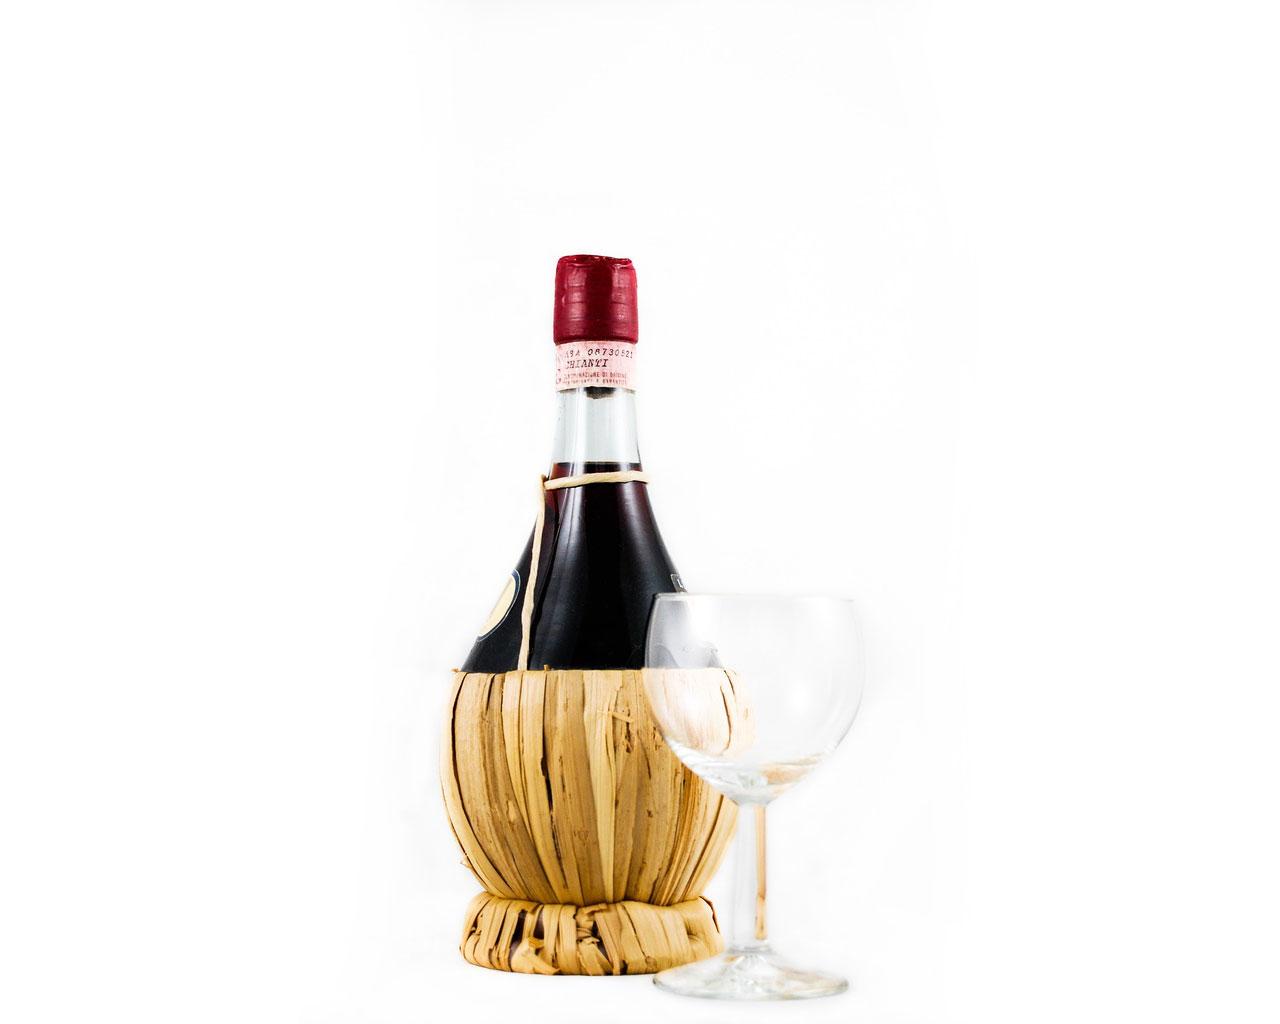 Artisanal red wine